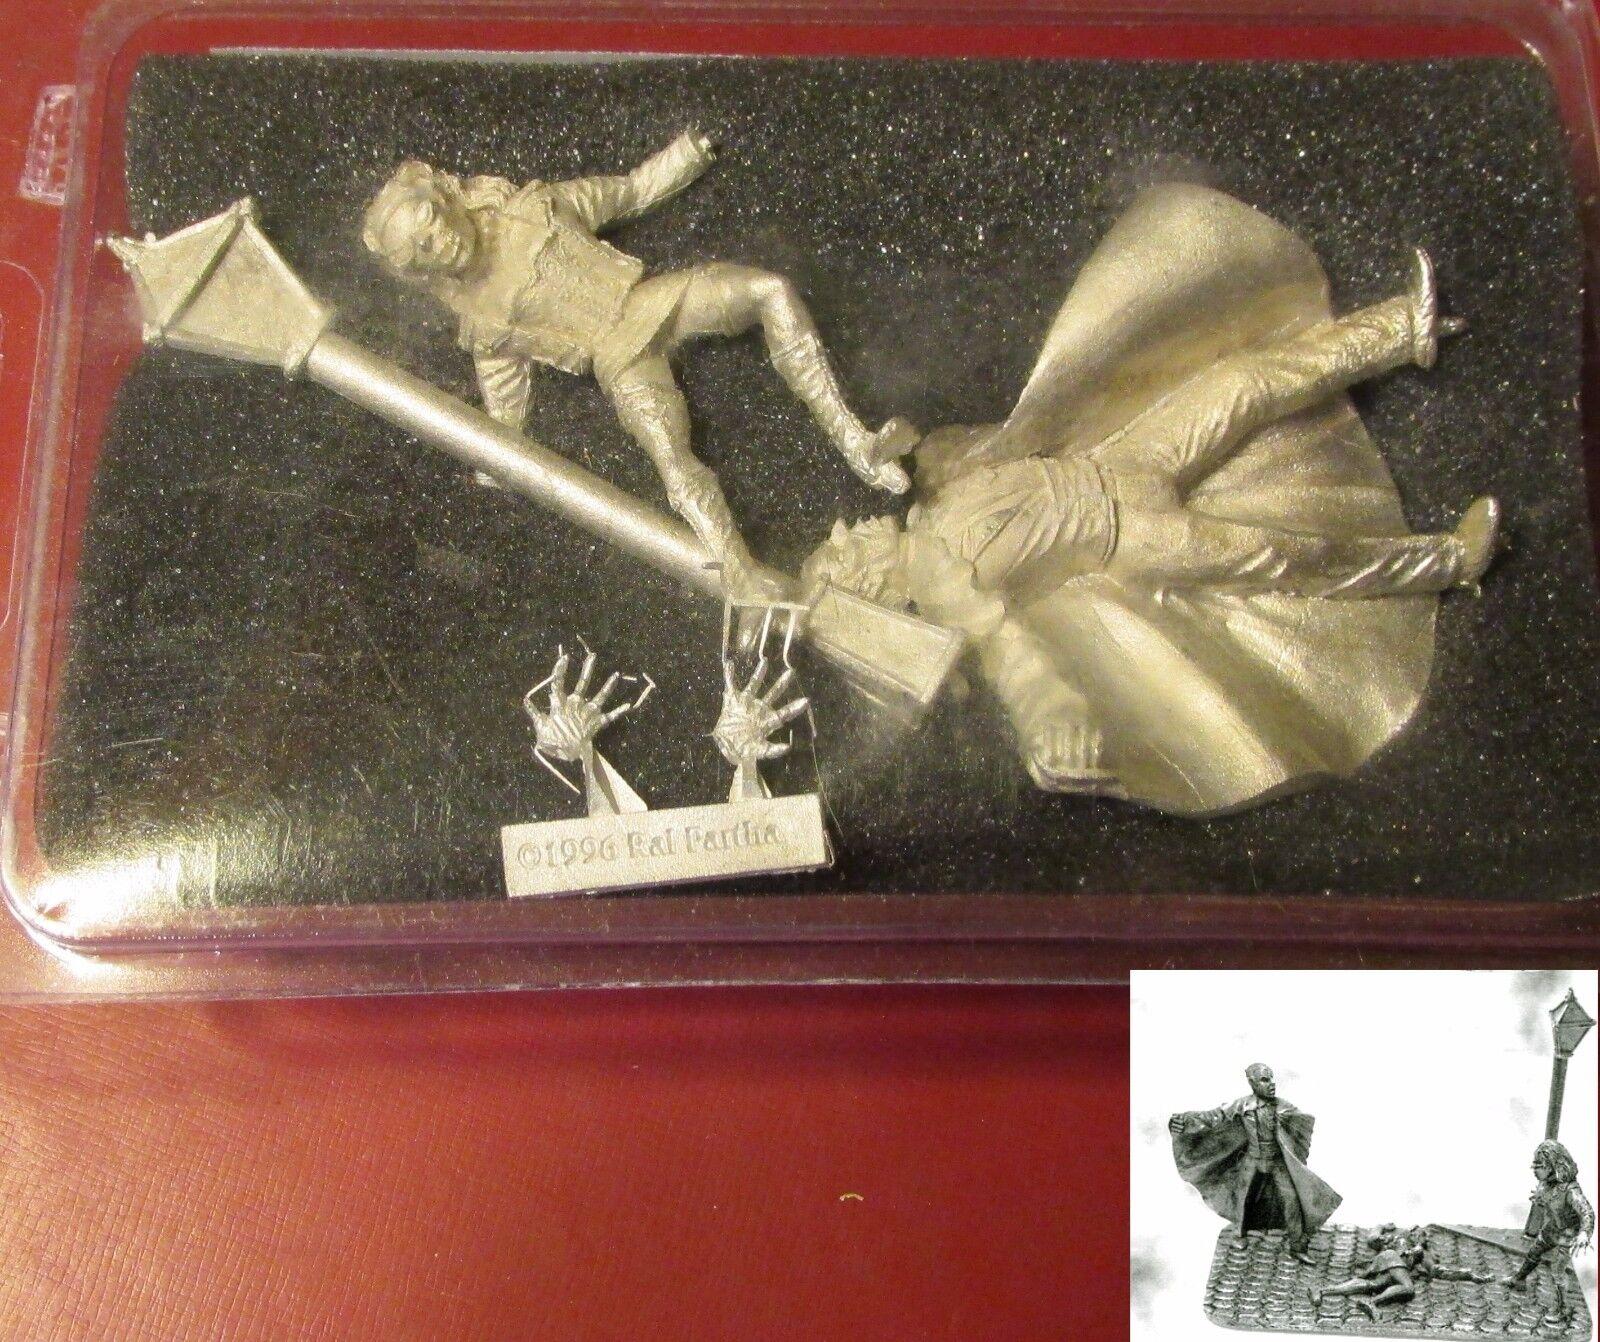 Ral Partha 10-672 Vampire Culture Clash Horror Vignette Elder vs Female Punk NIB